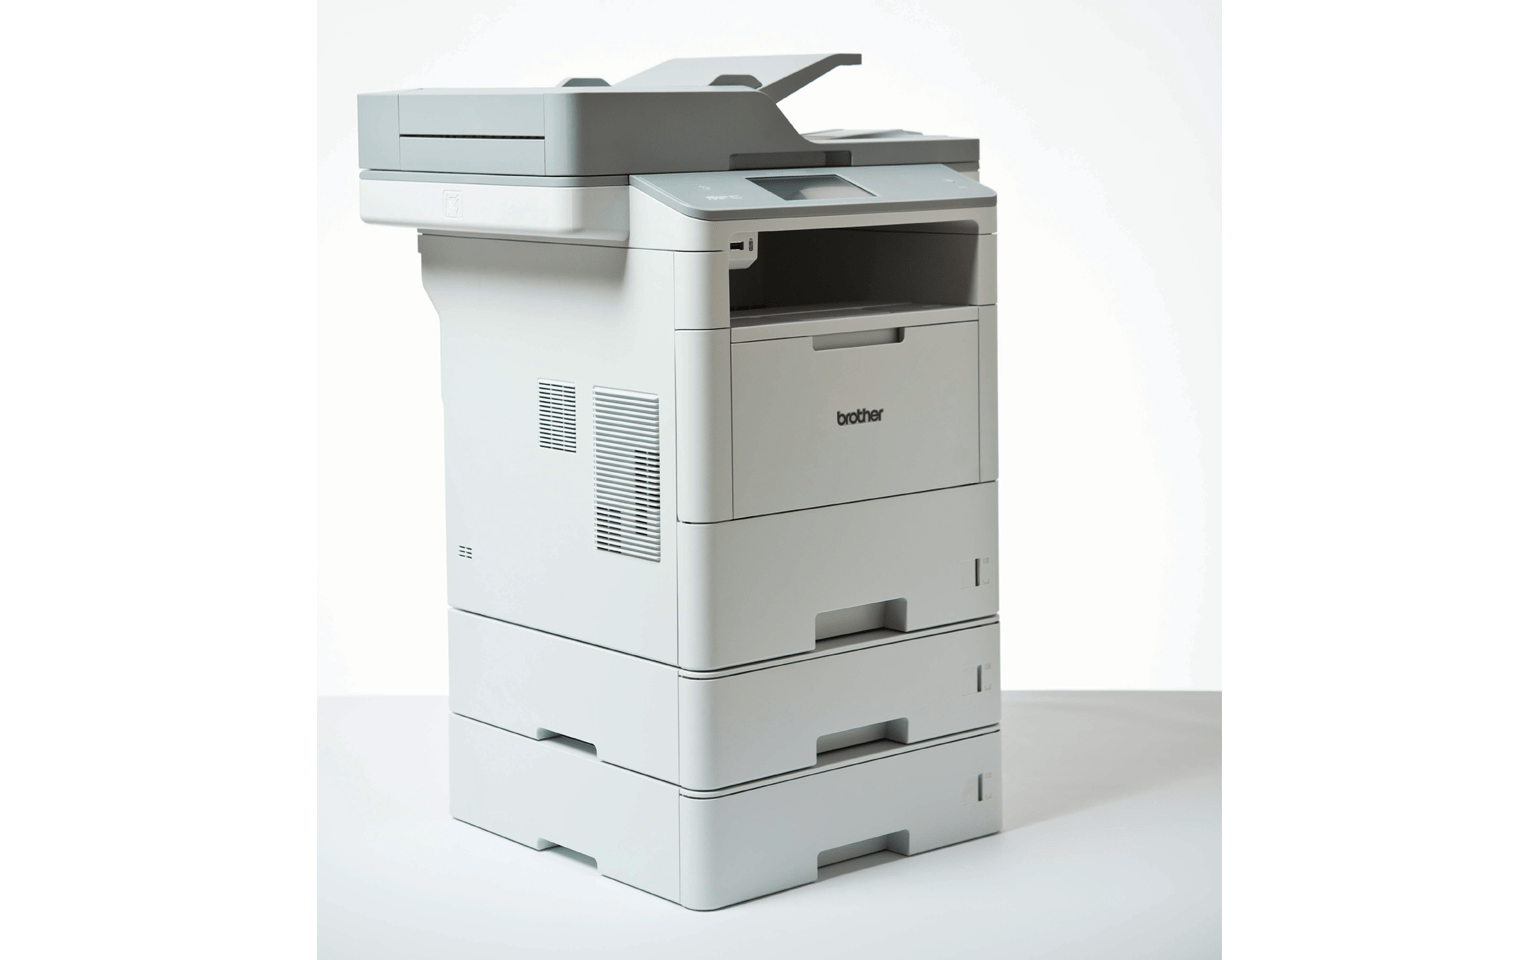 MFC-L6900DW Wireless Mono Laser Printer 7